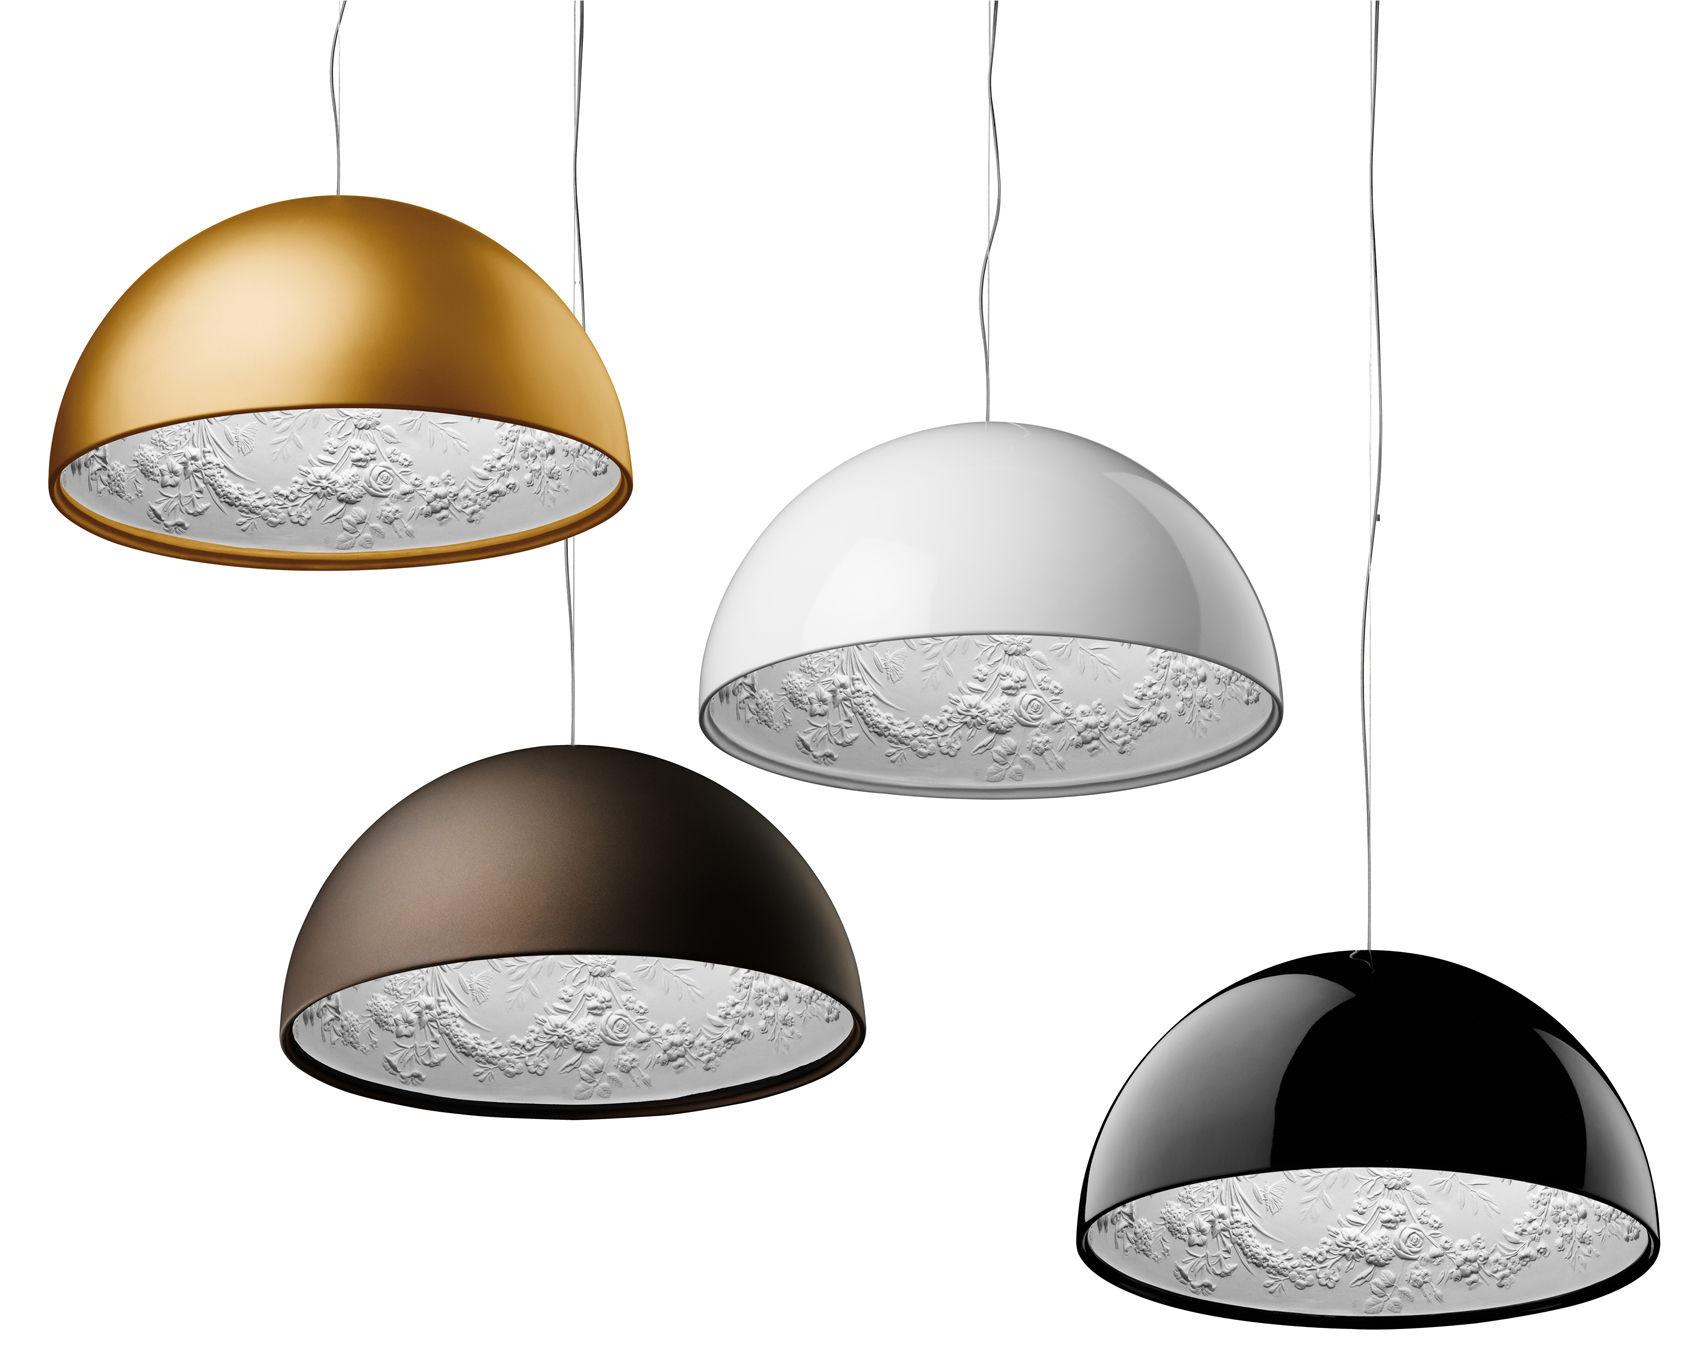 lampadari flos : ... Illuminazione > Lampadari > Sospensione Skygarden 2 - ? 90 cm di Flos